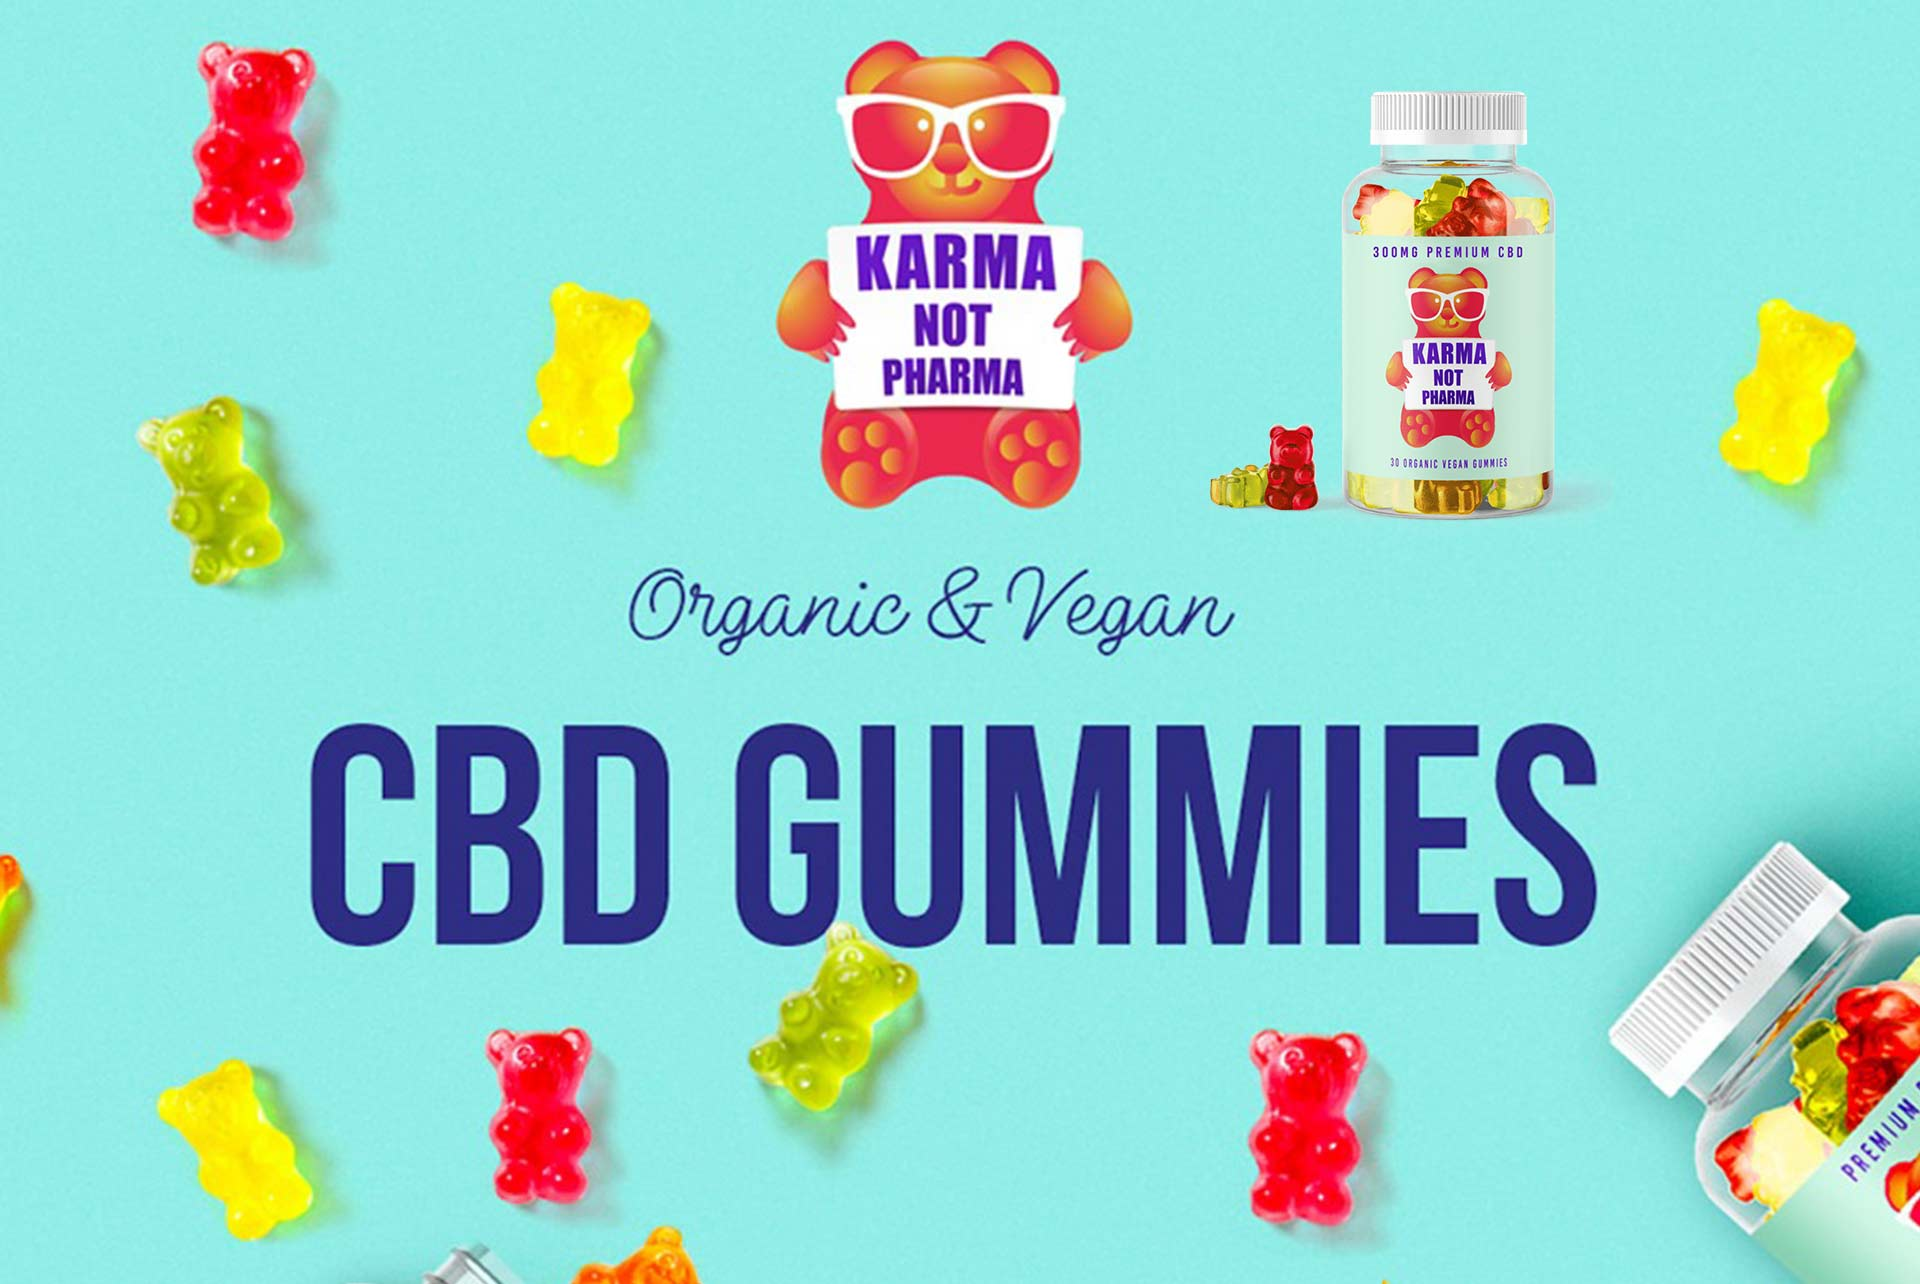 Is Karma Not Pharma CBD Cruelty-Free & Vegan?